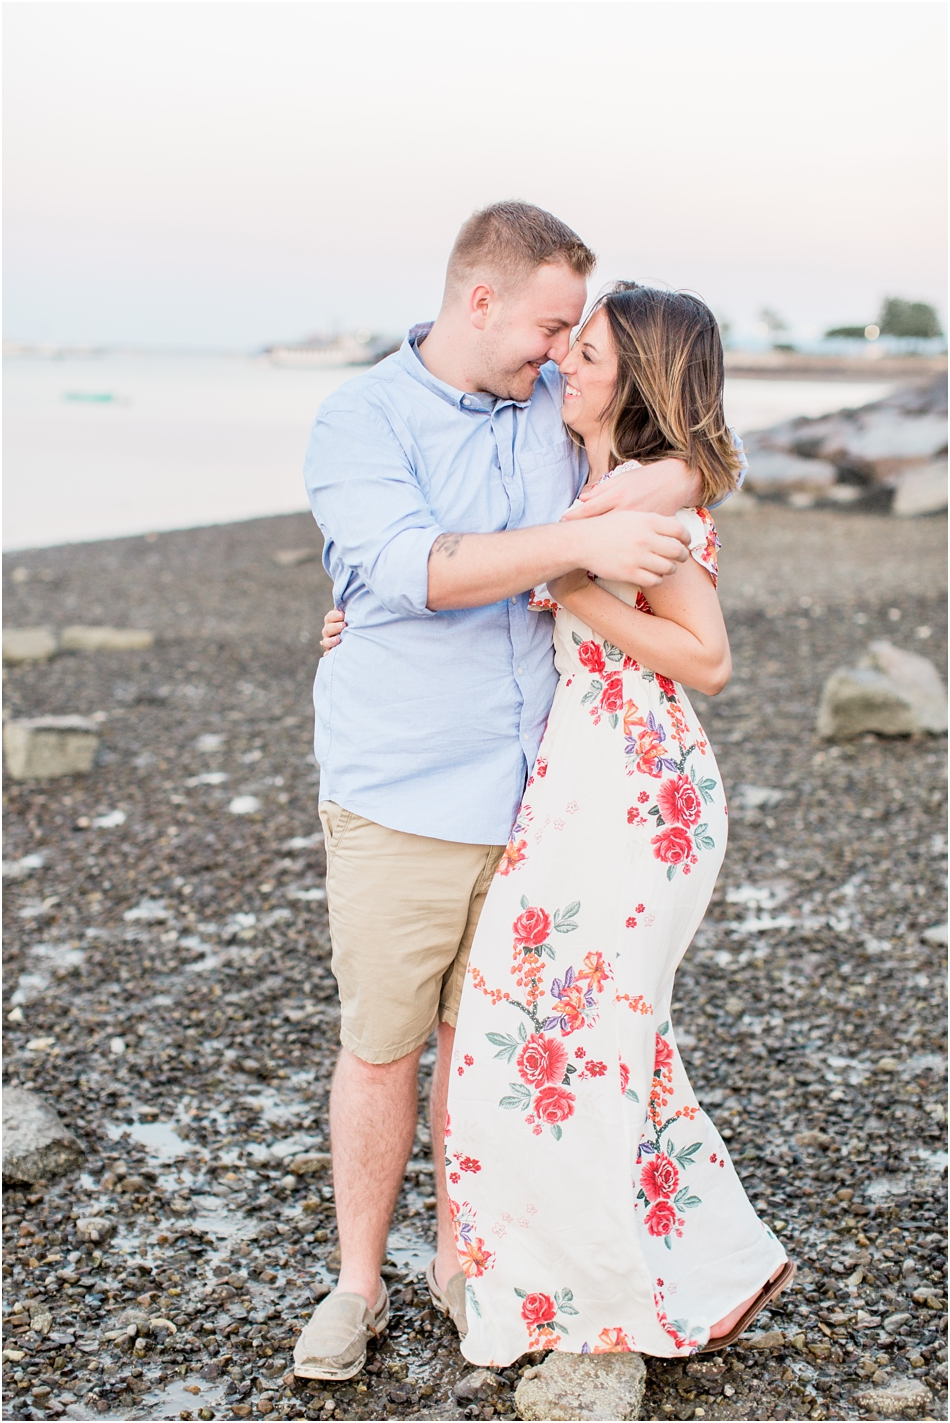 plymouth_downtown_engagement_boston_massachusetts_cape_cod_new_england_wedding_photographer_Meredith_Jane_Photography_photo_1663.jpg